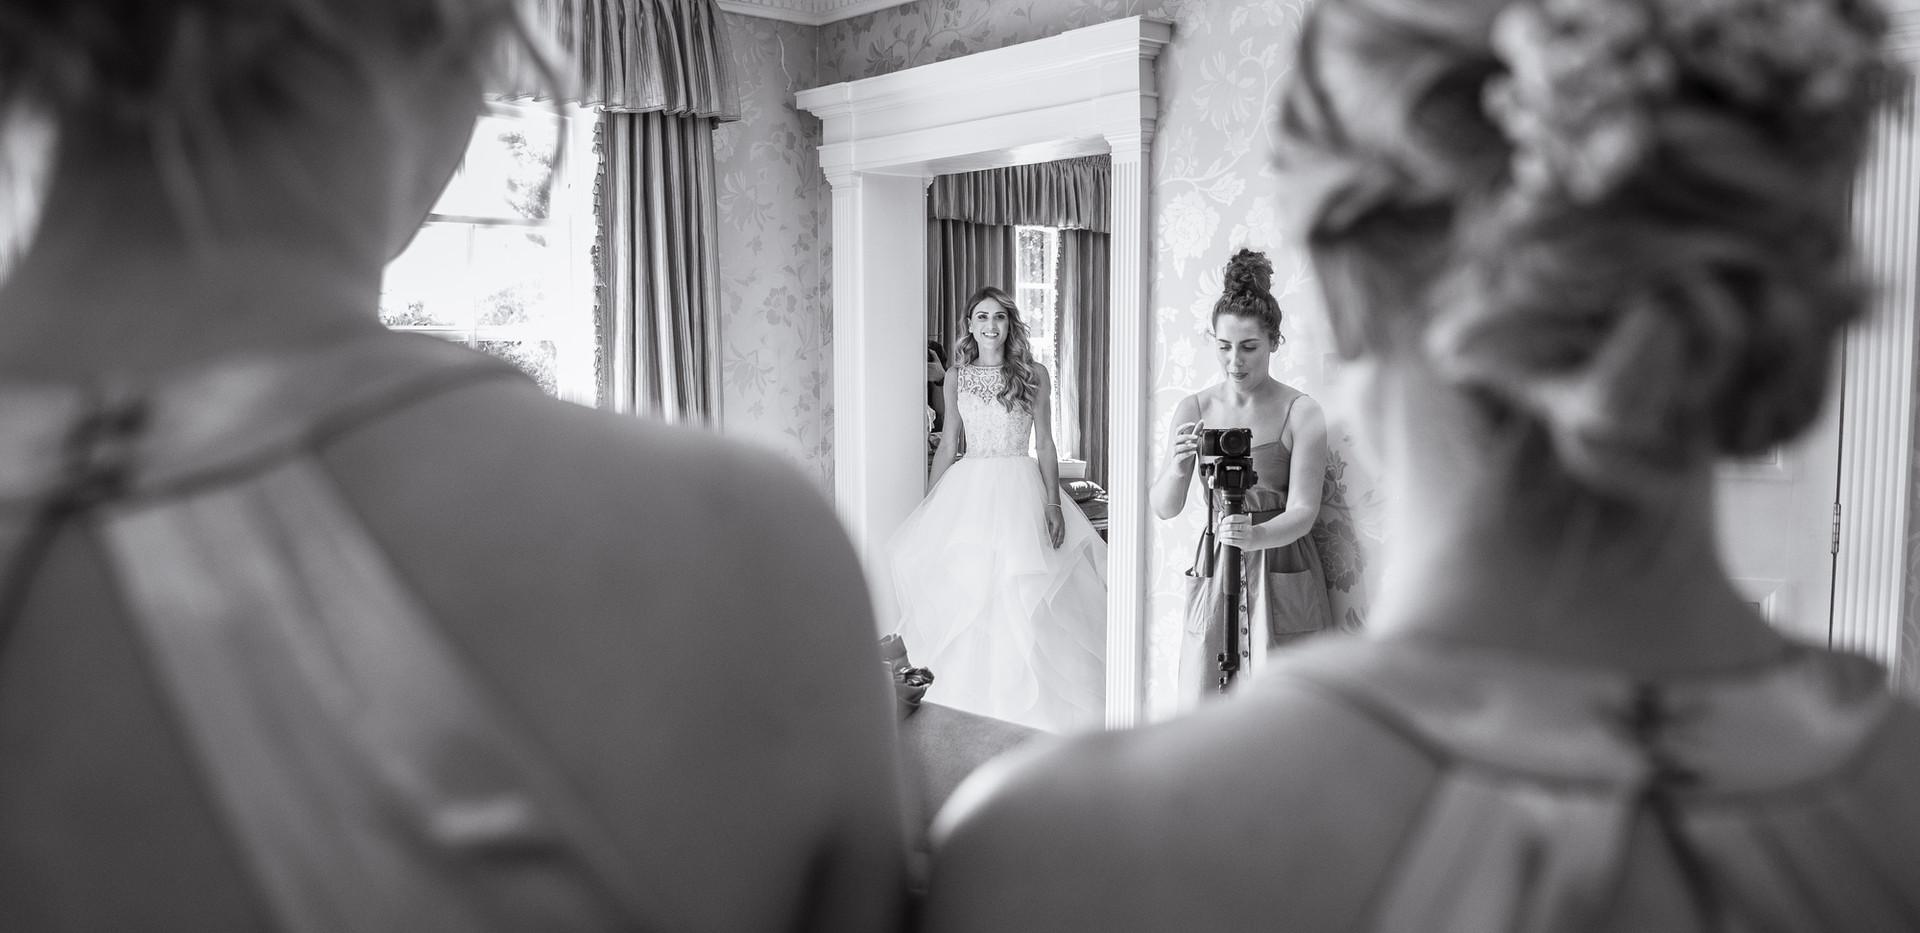 Delamere Manor Wedding Photography___13.